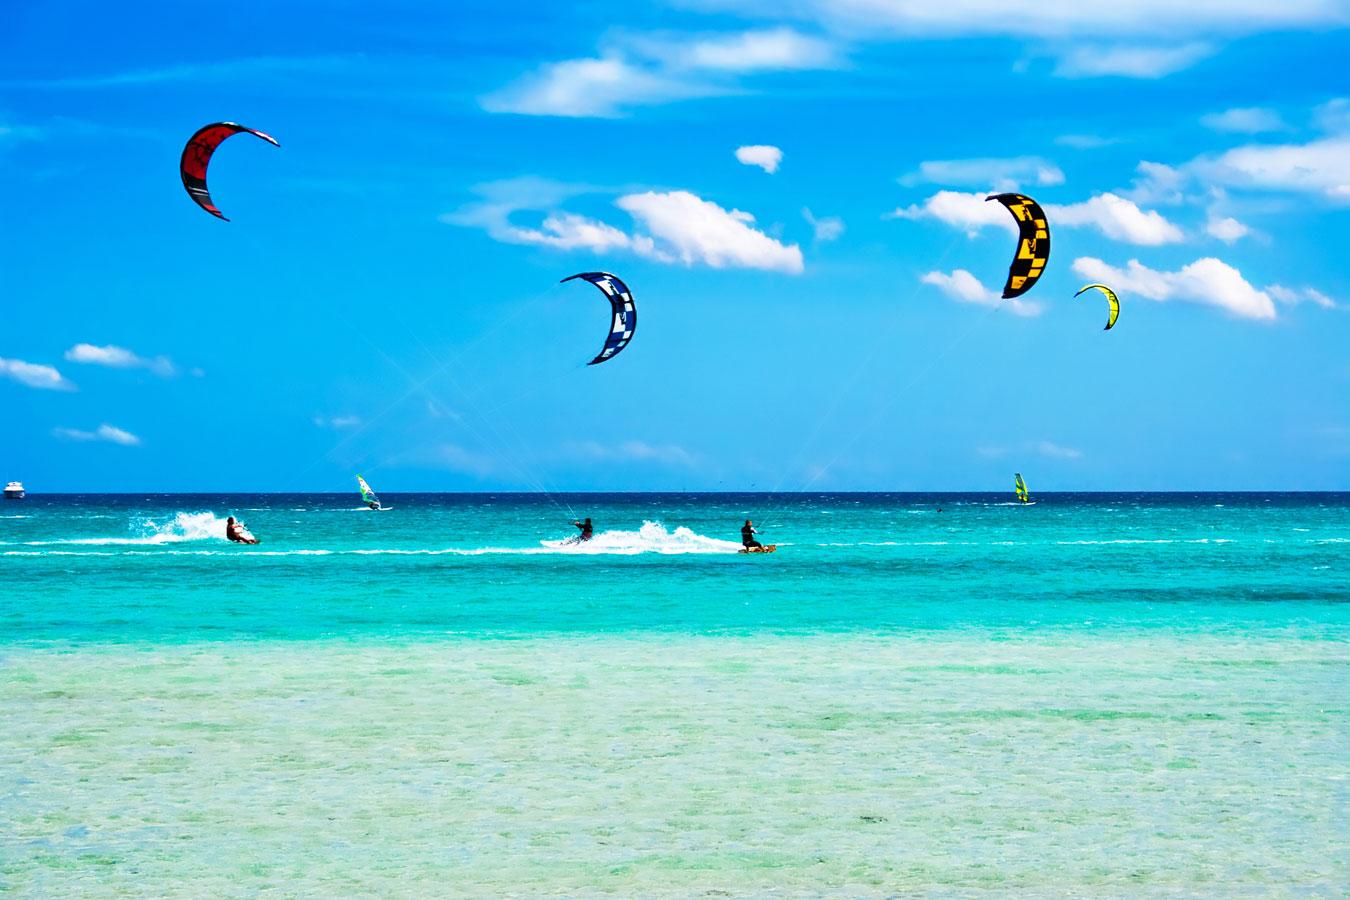 kite surfing in zanzibar at the Z hotel